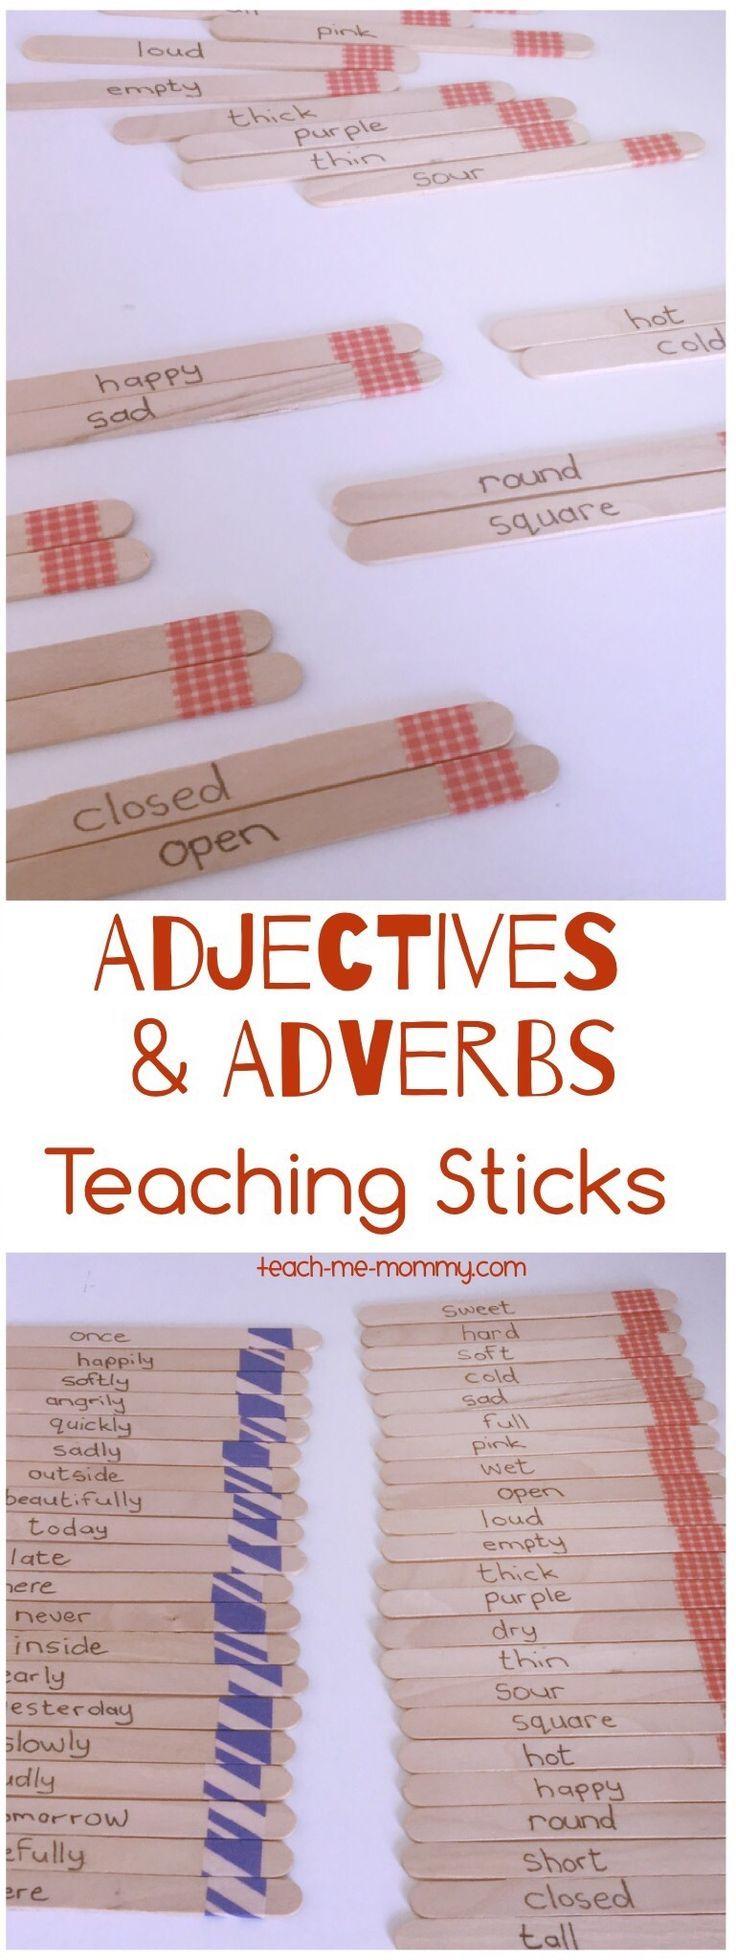 Adjectives & Adverbs Sticks for teaching children!